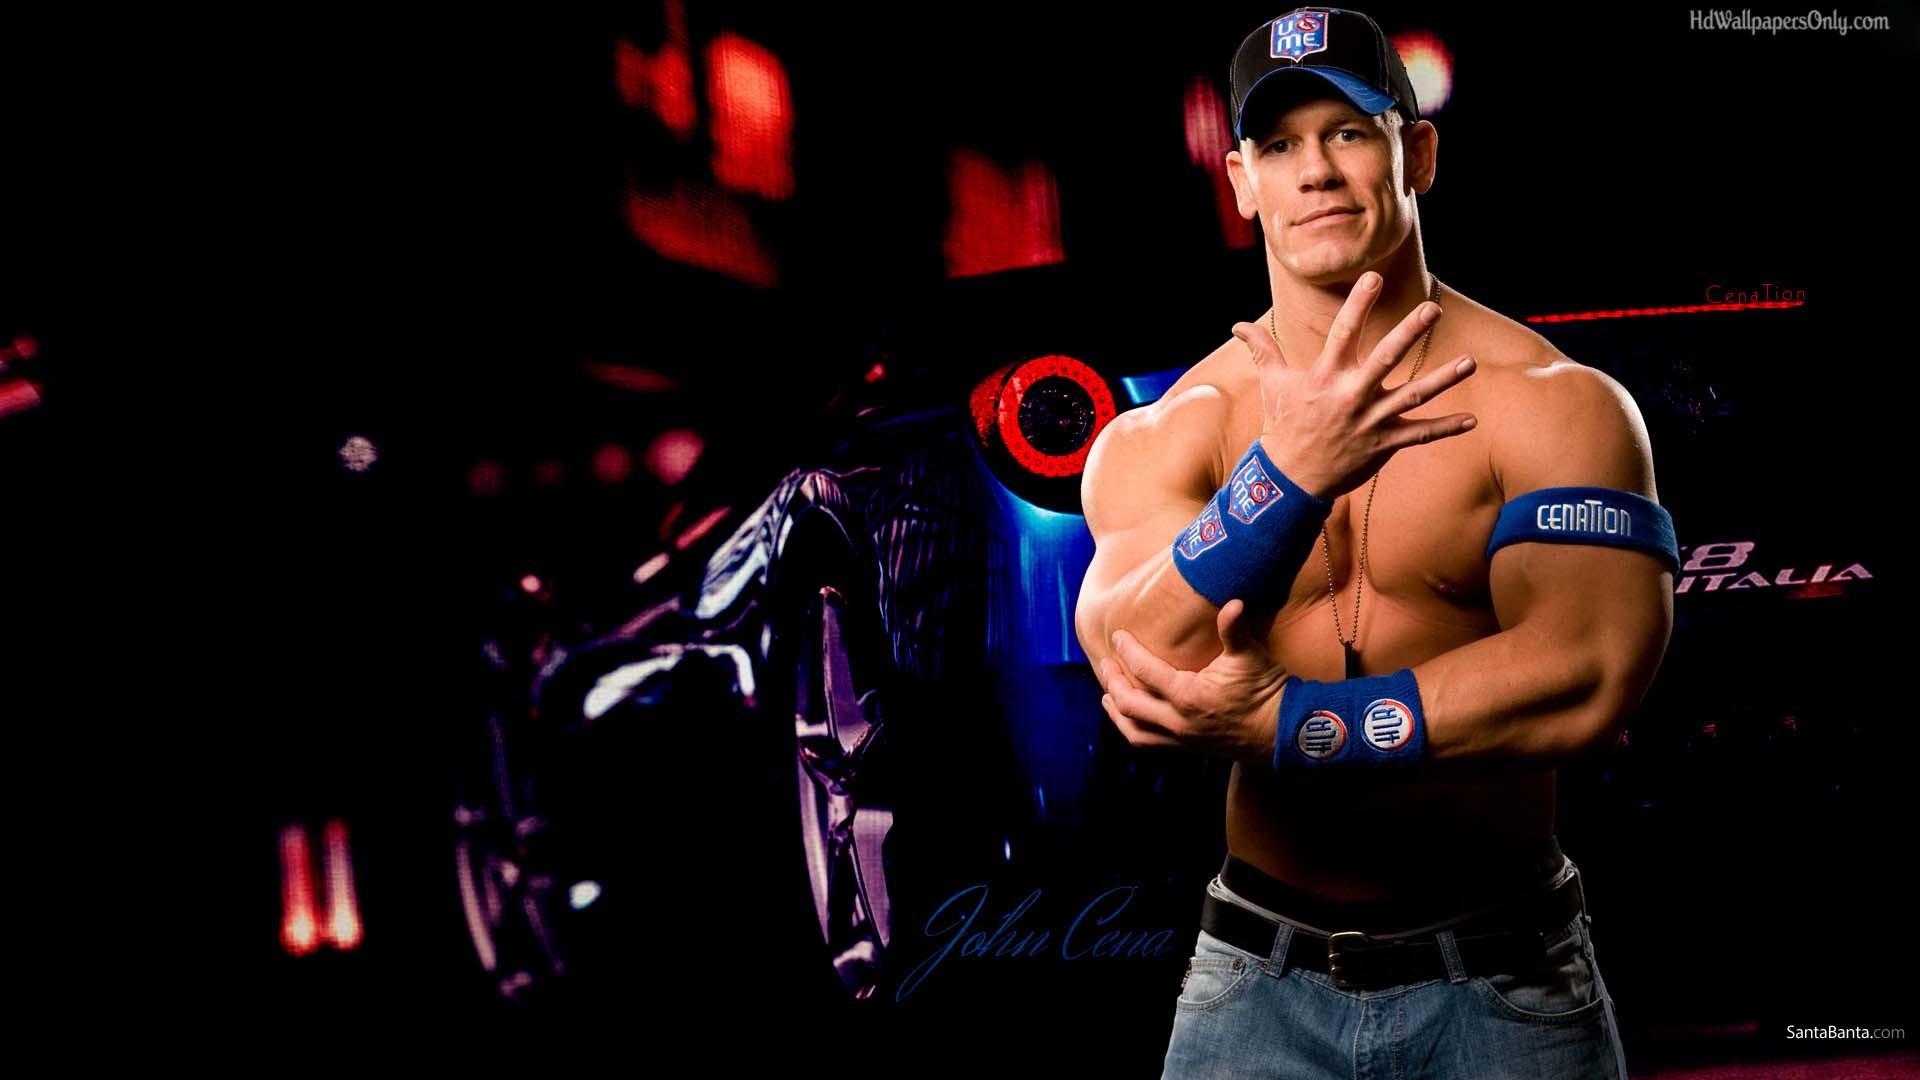 WWE John Cena Wallpaper 2018 (55+ Images